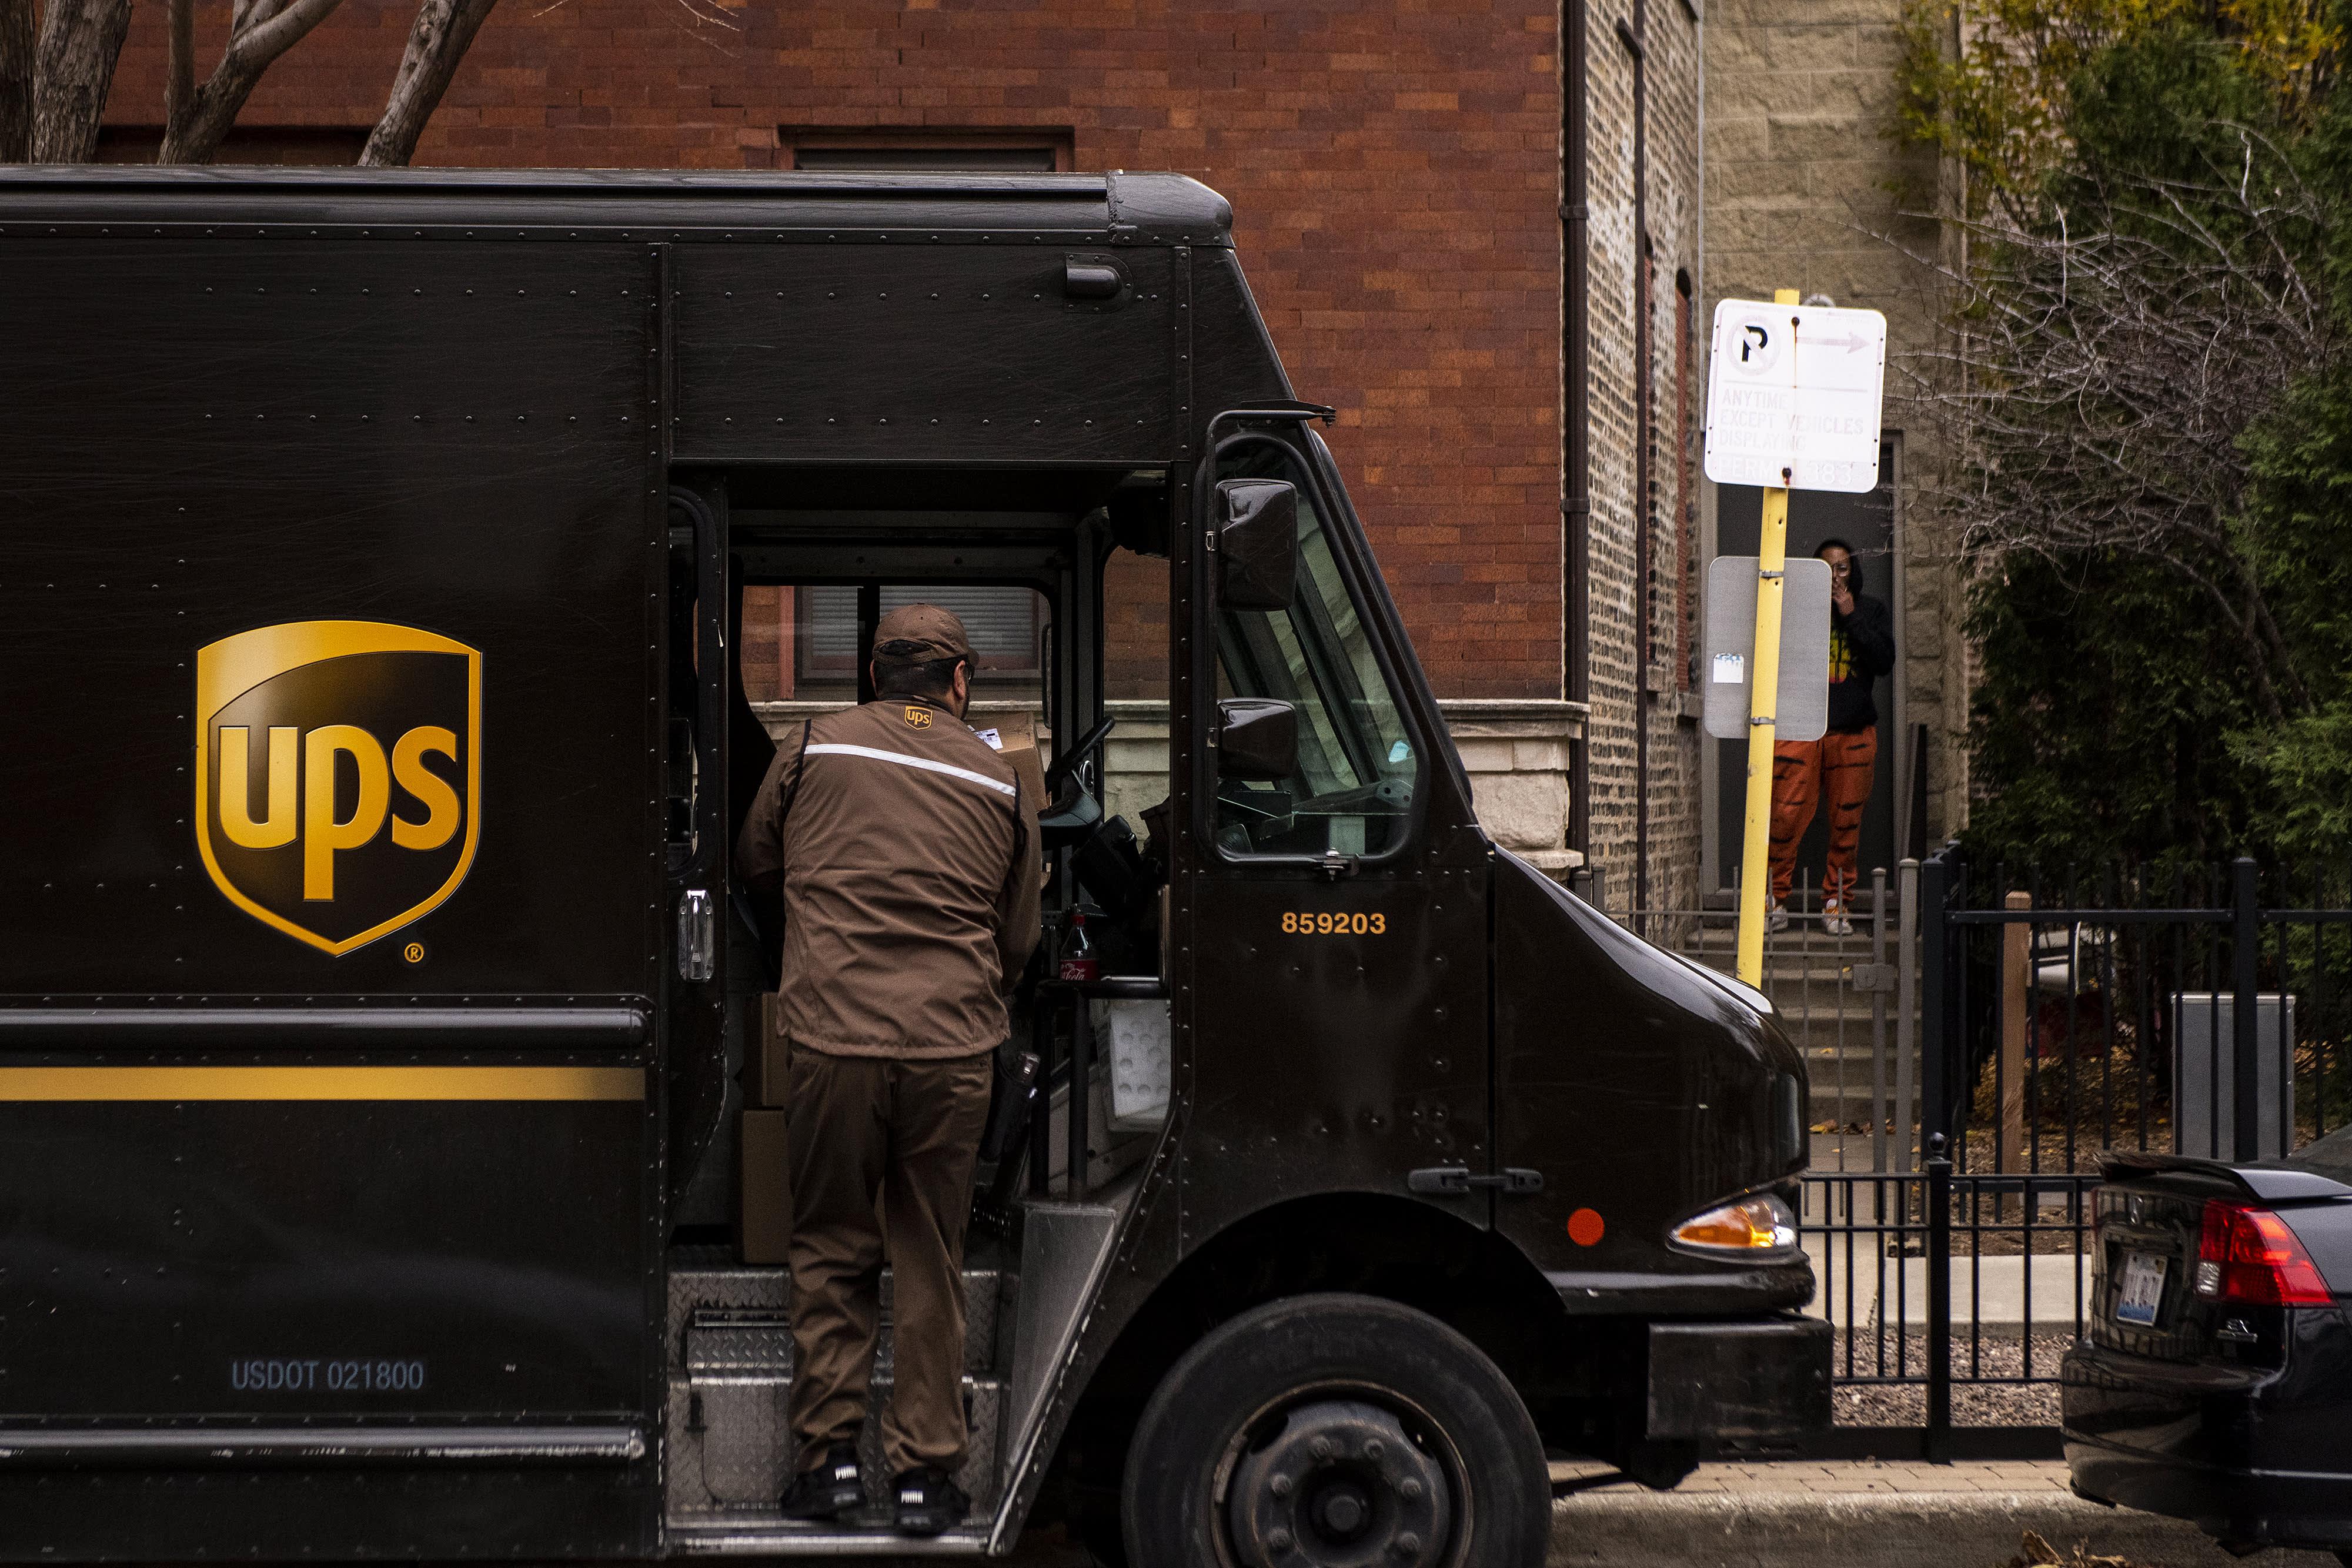 UPS profit rises 23% on e-commerce demand